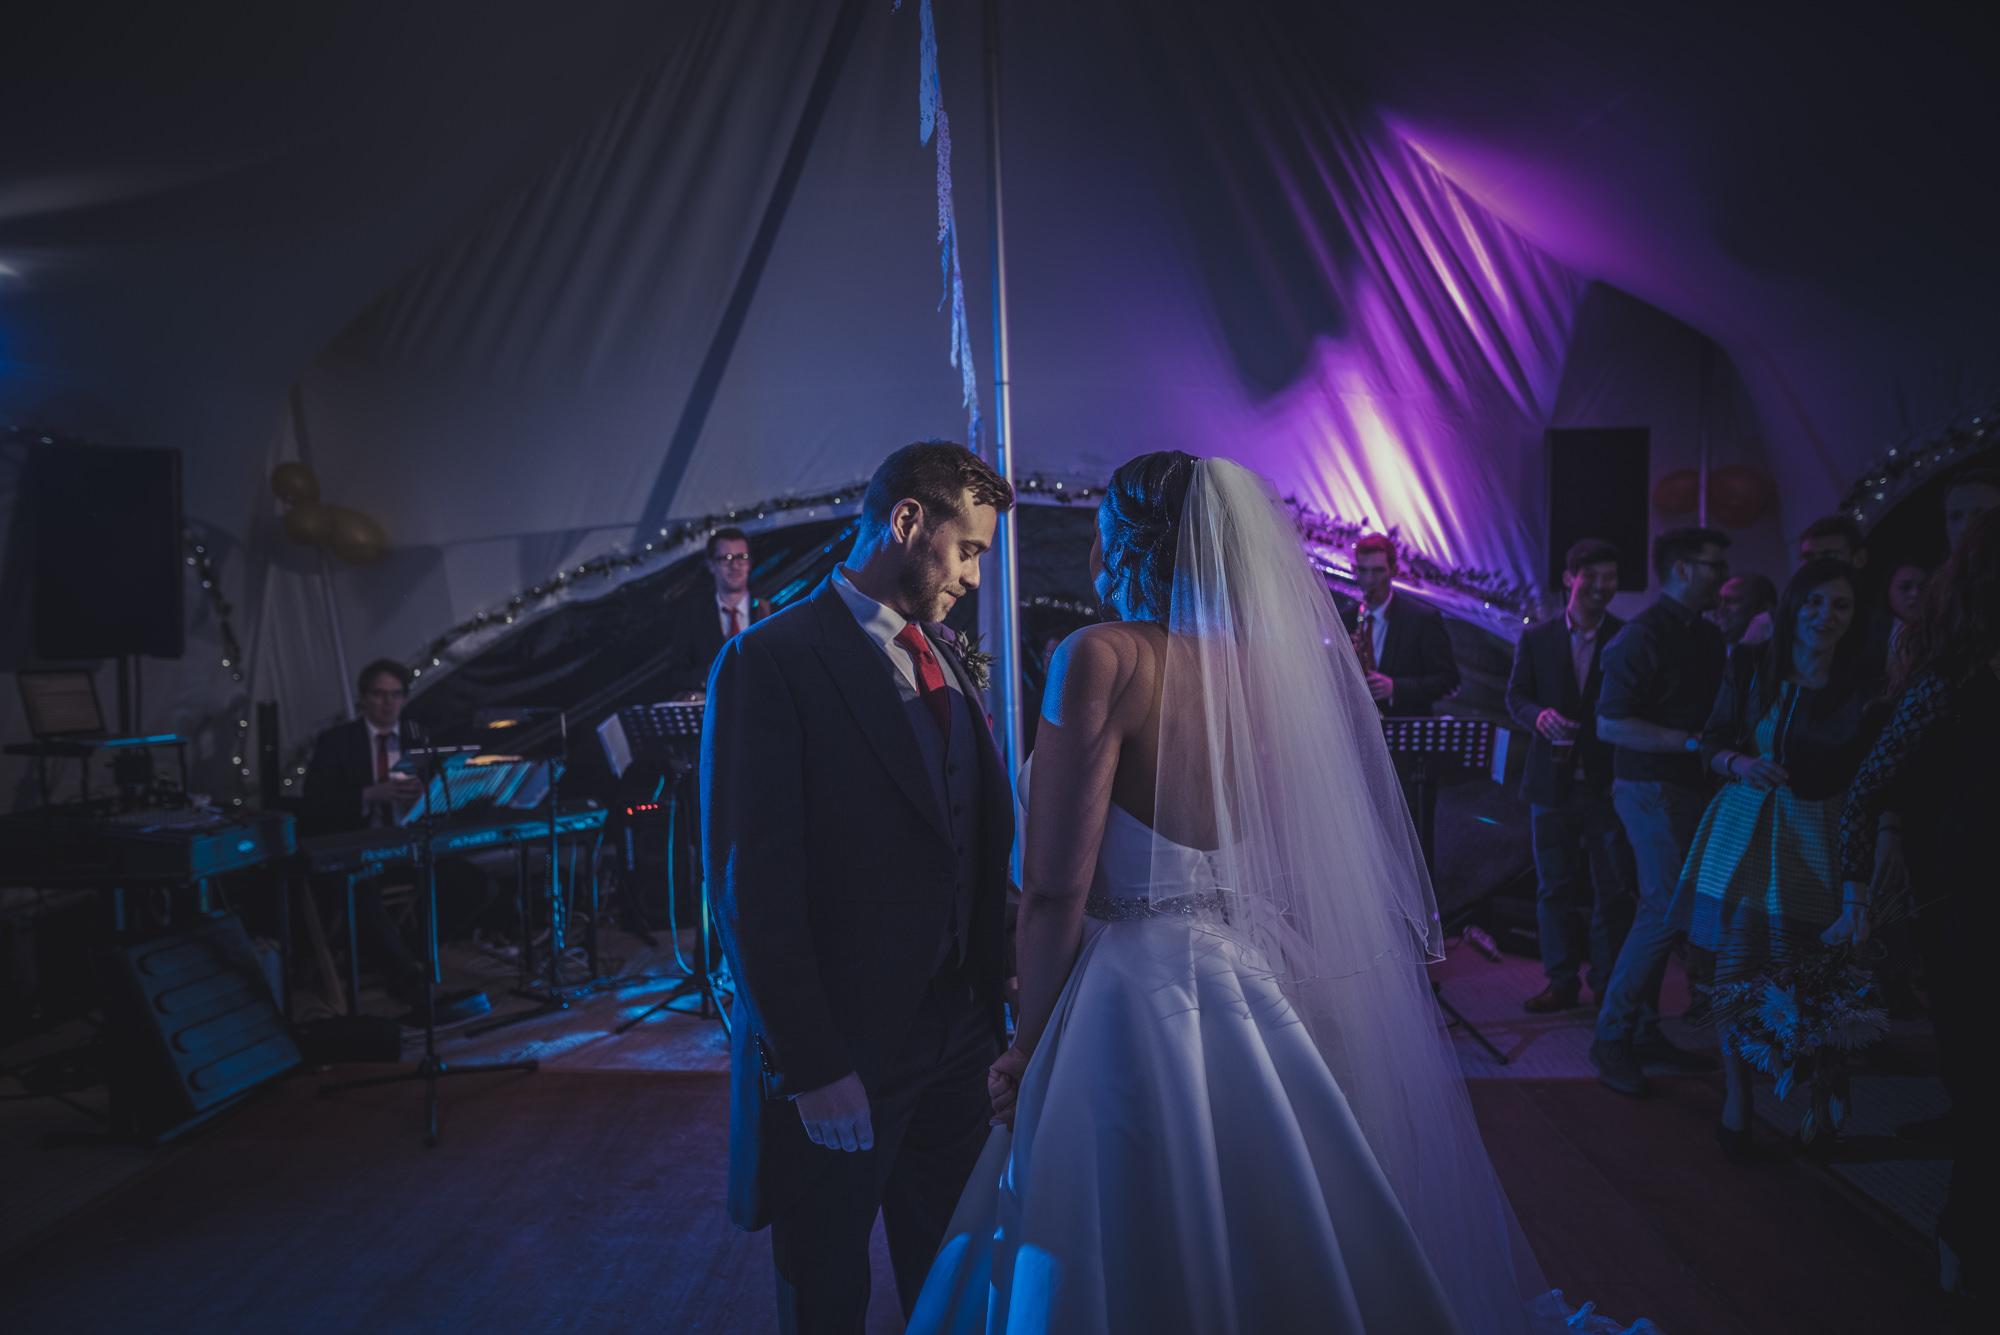 Jacqueline-Gareth-Wedding-Westmead-Events-Surrey-Manu-Mendoza-Wedding-Photography-507.jpg